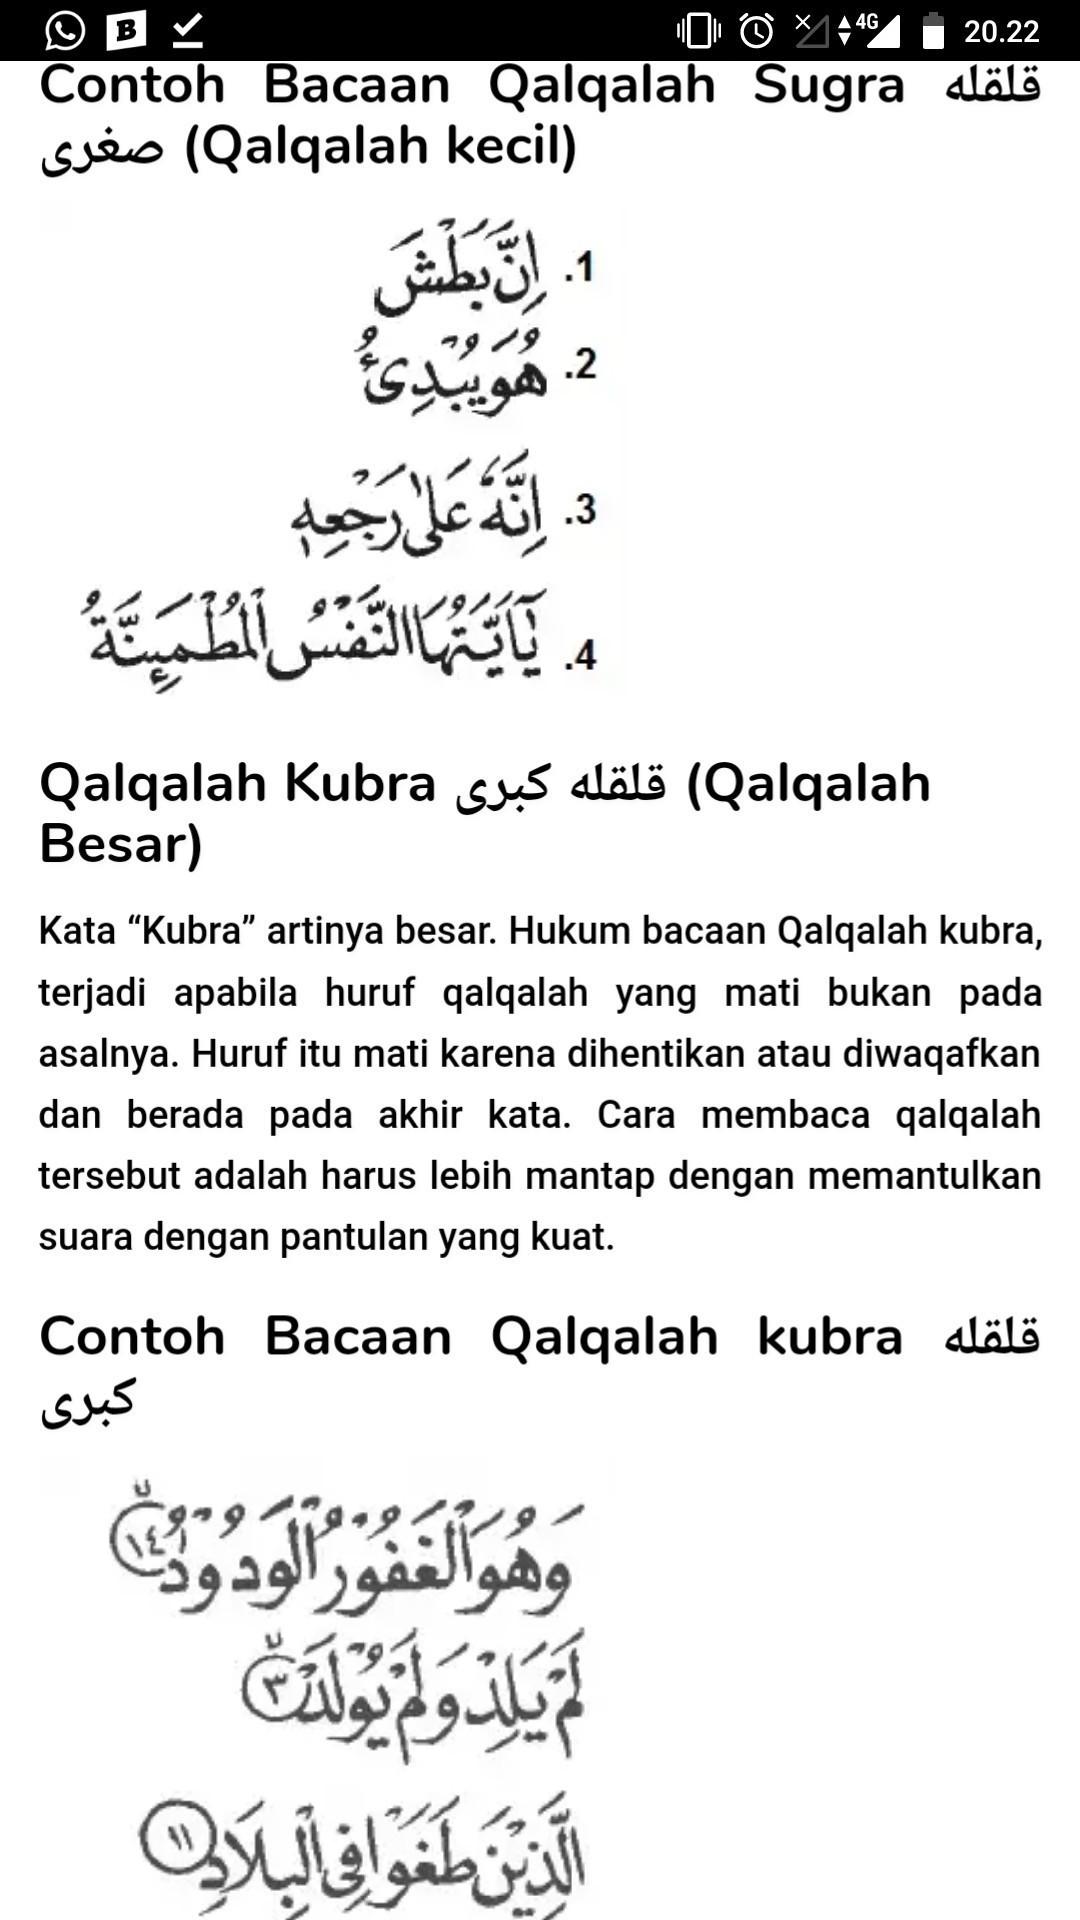 Qalqalah Sugra : qalqalah, sugra, Jelaskan, Pengertian, Hukum, Bacaan, Qalqalah, Kubra, Sugra, Setra, Berikan, Masing, Contoh, Brainly.co.id